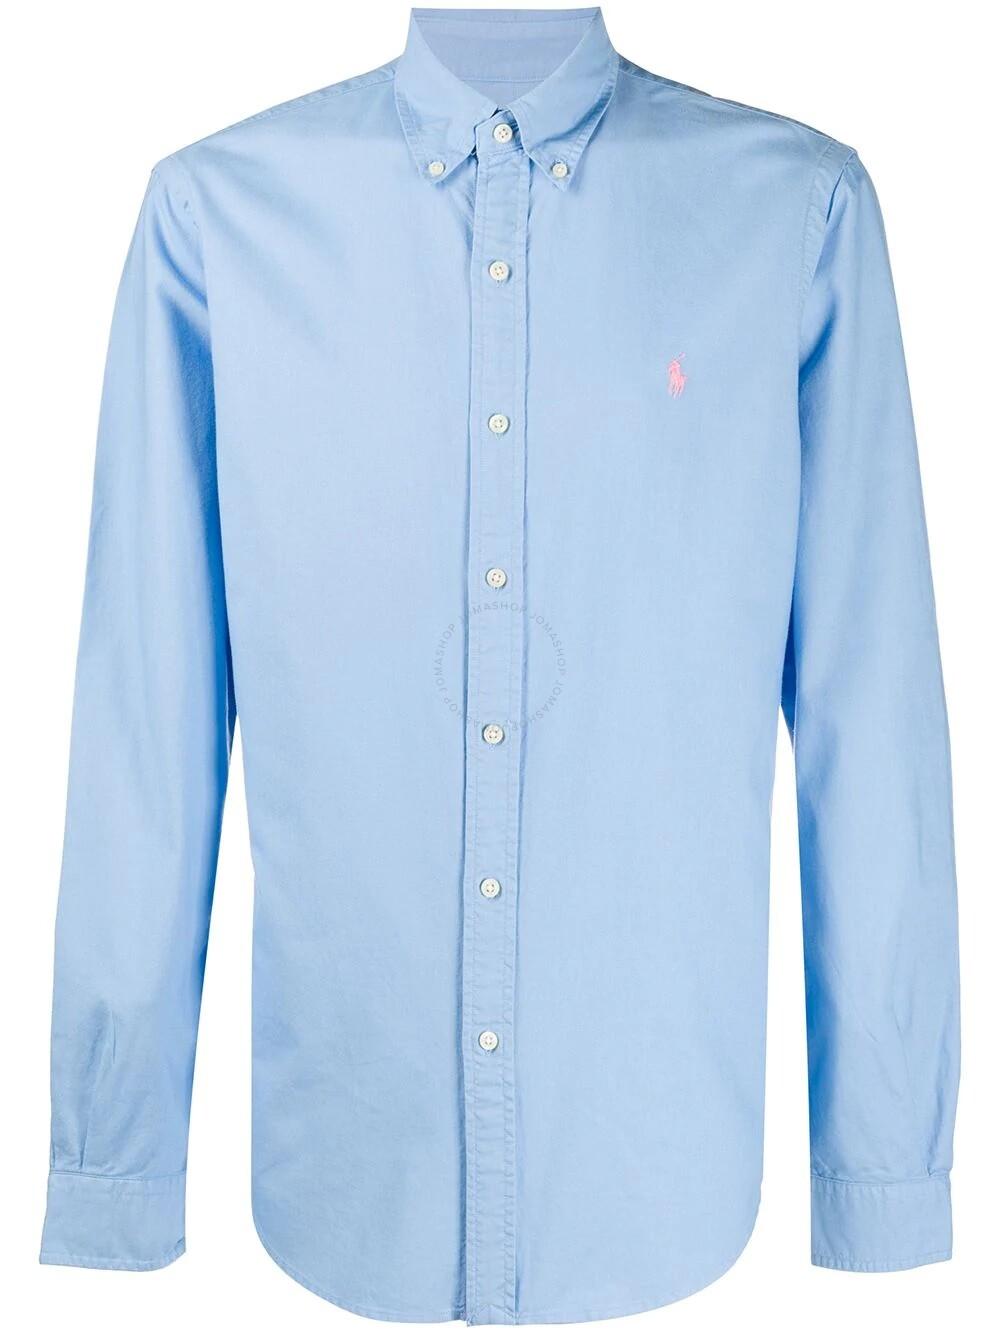 Polo Ralph Lauren Men's Blue Logo-embroidered Cotton Oxford Shirt